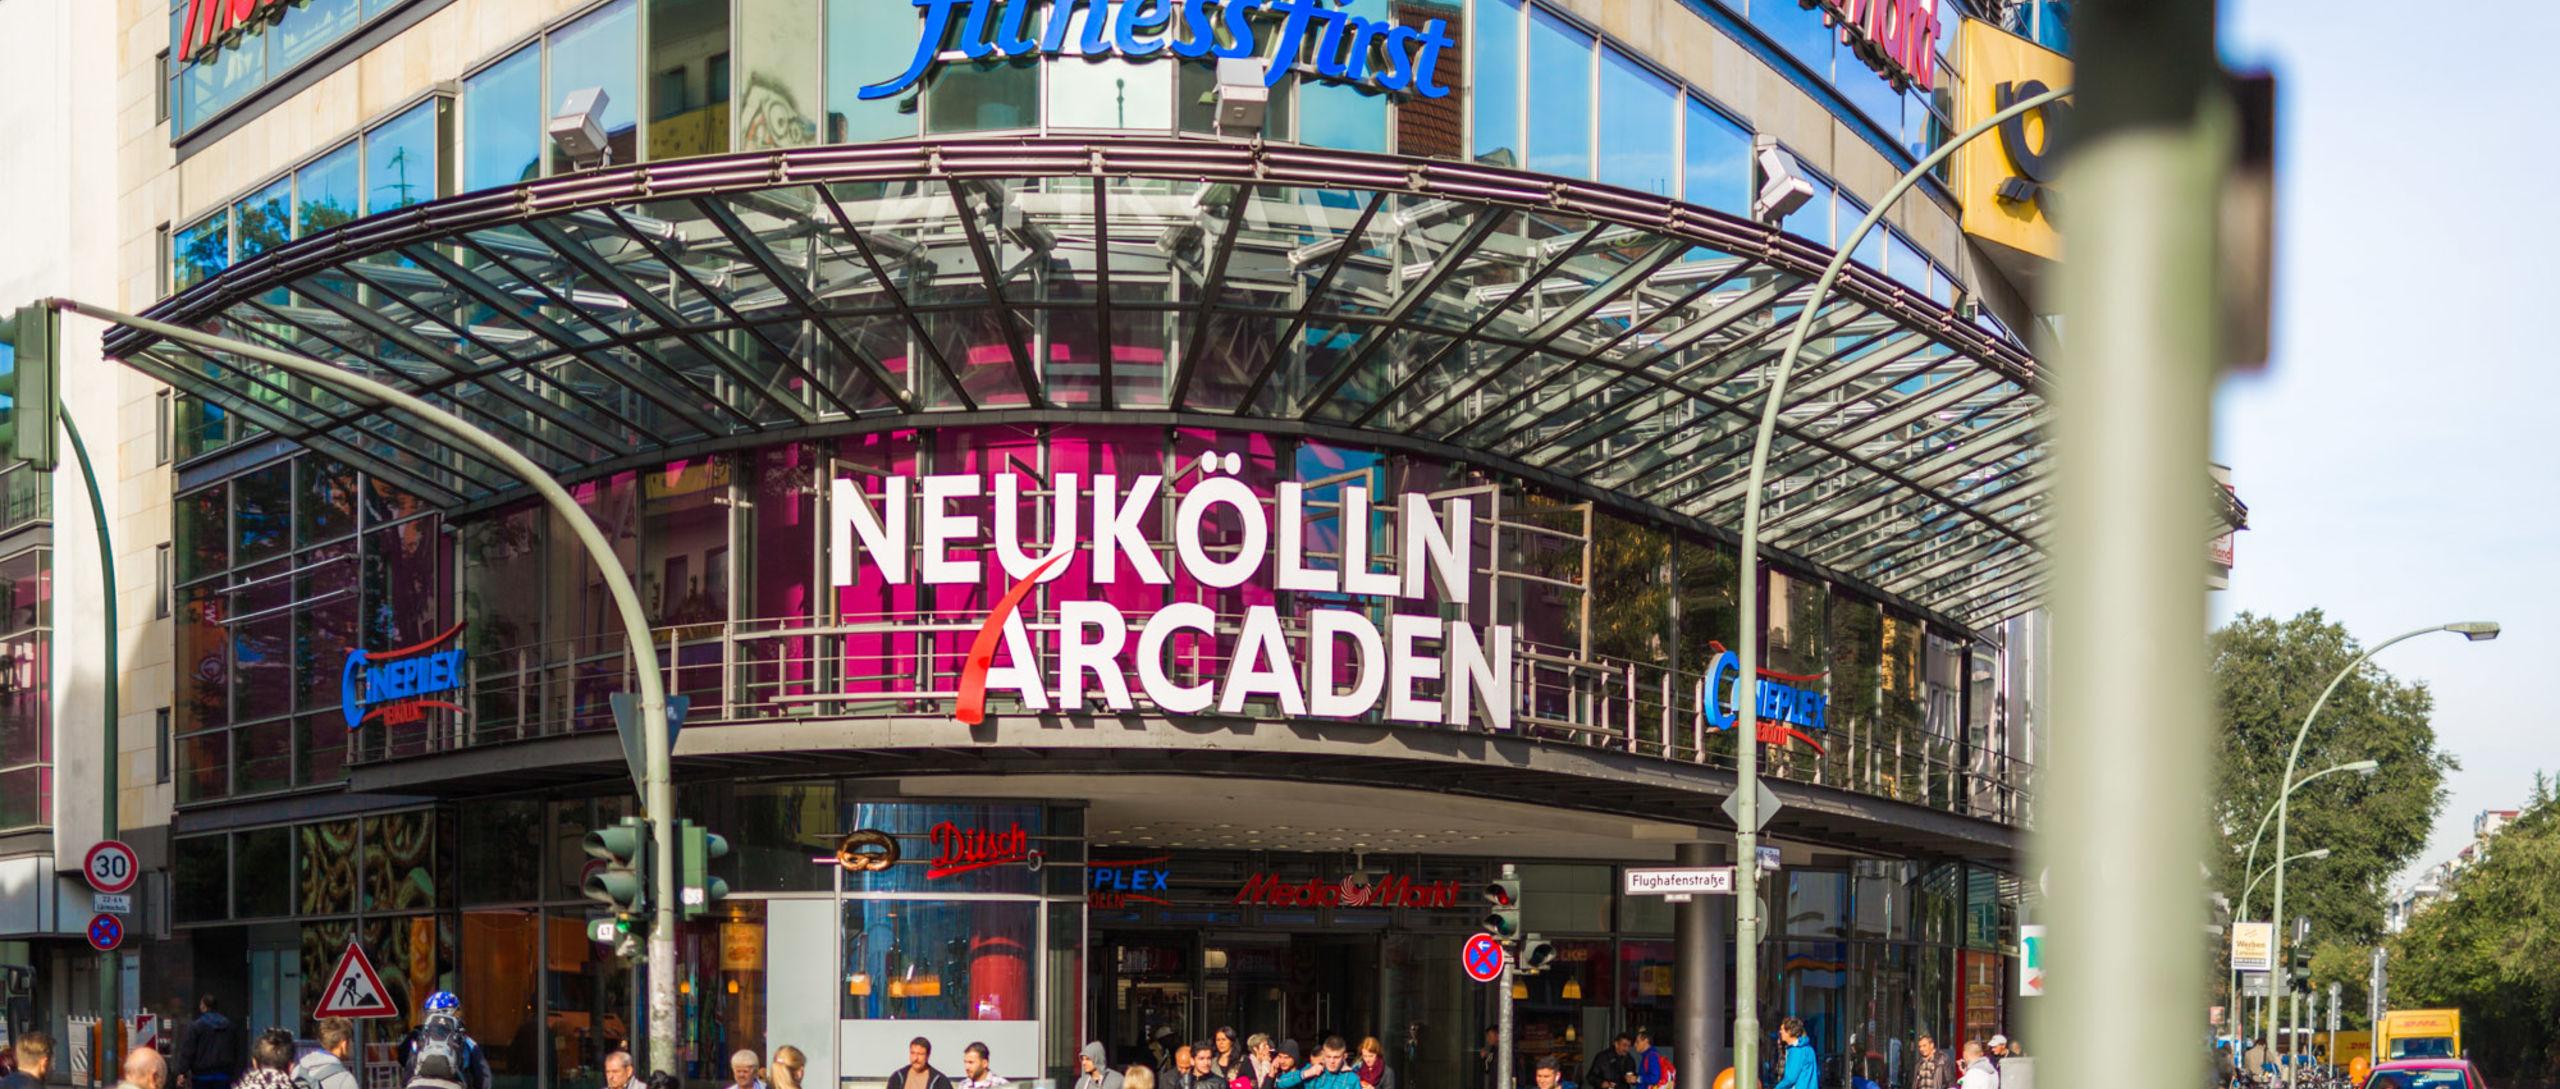 Lengeschäfte Berlin ihre wohnung in berlin neukölln mieten